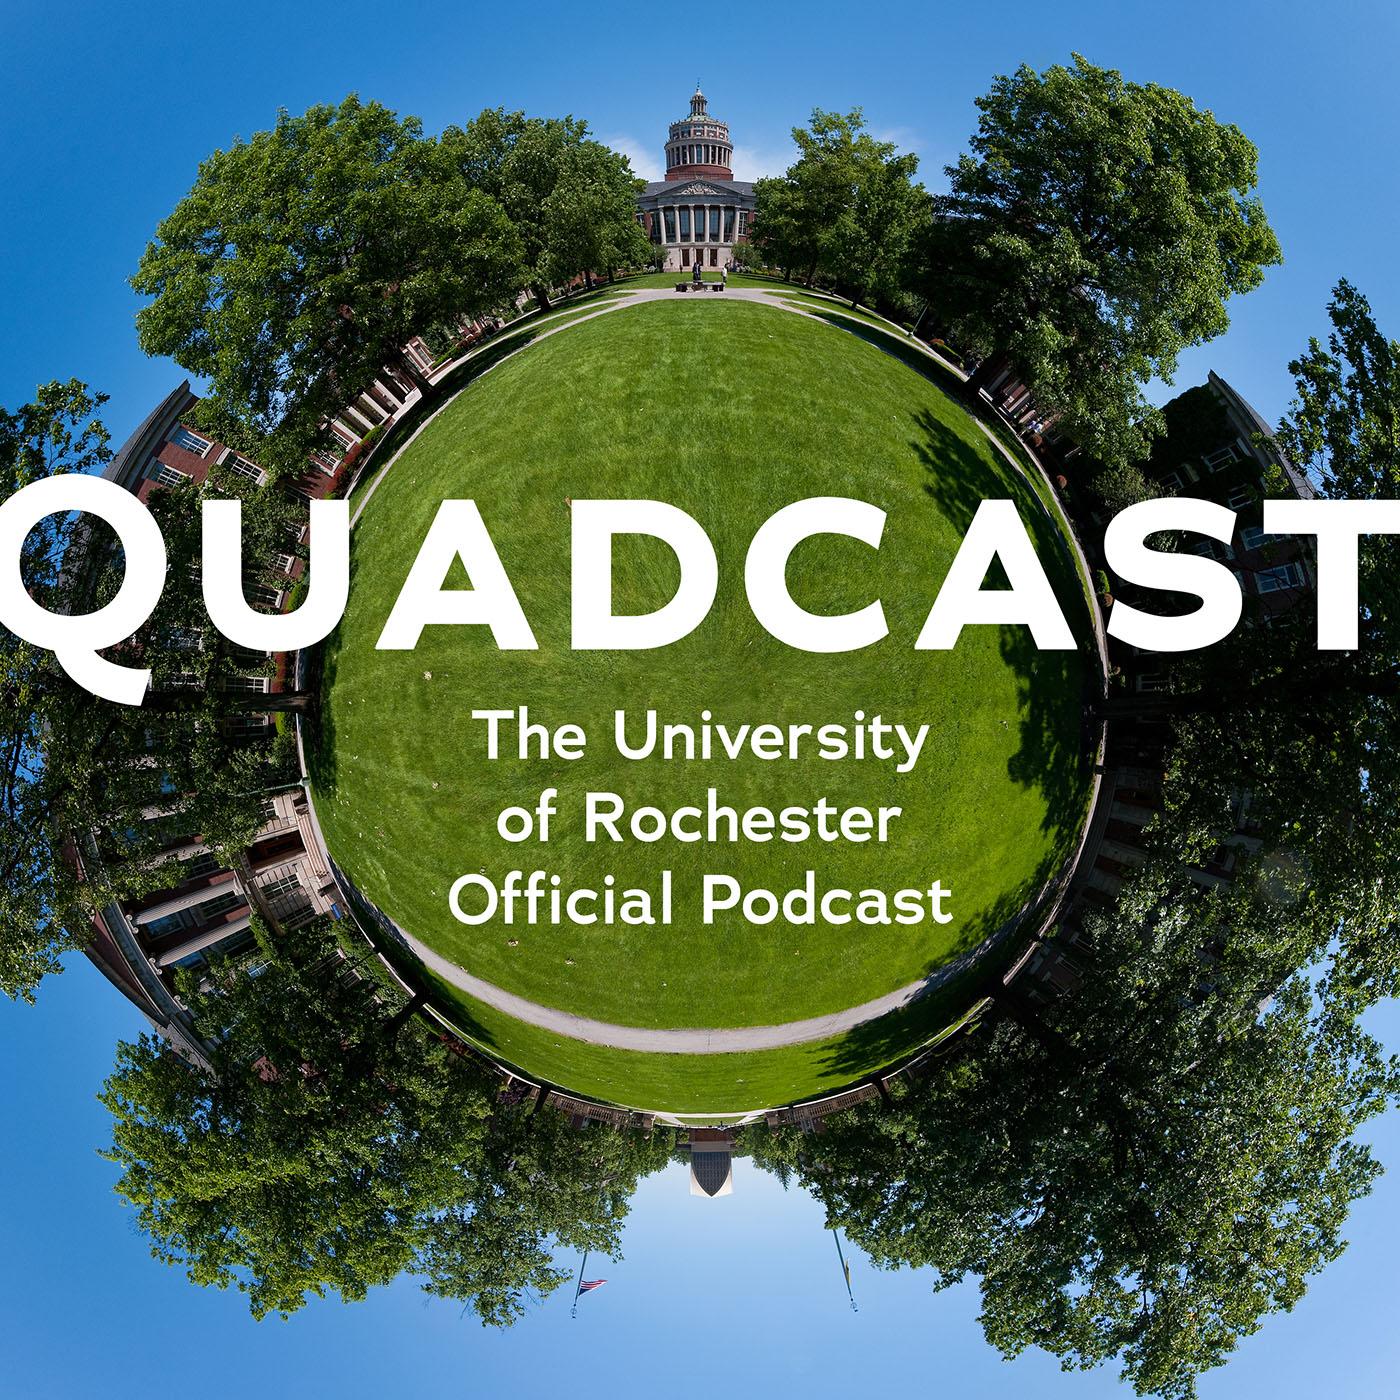 University of Rochester's Quadcast show art